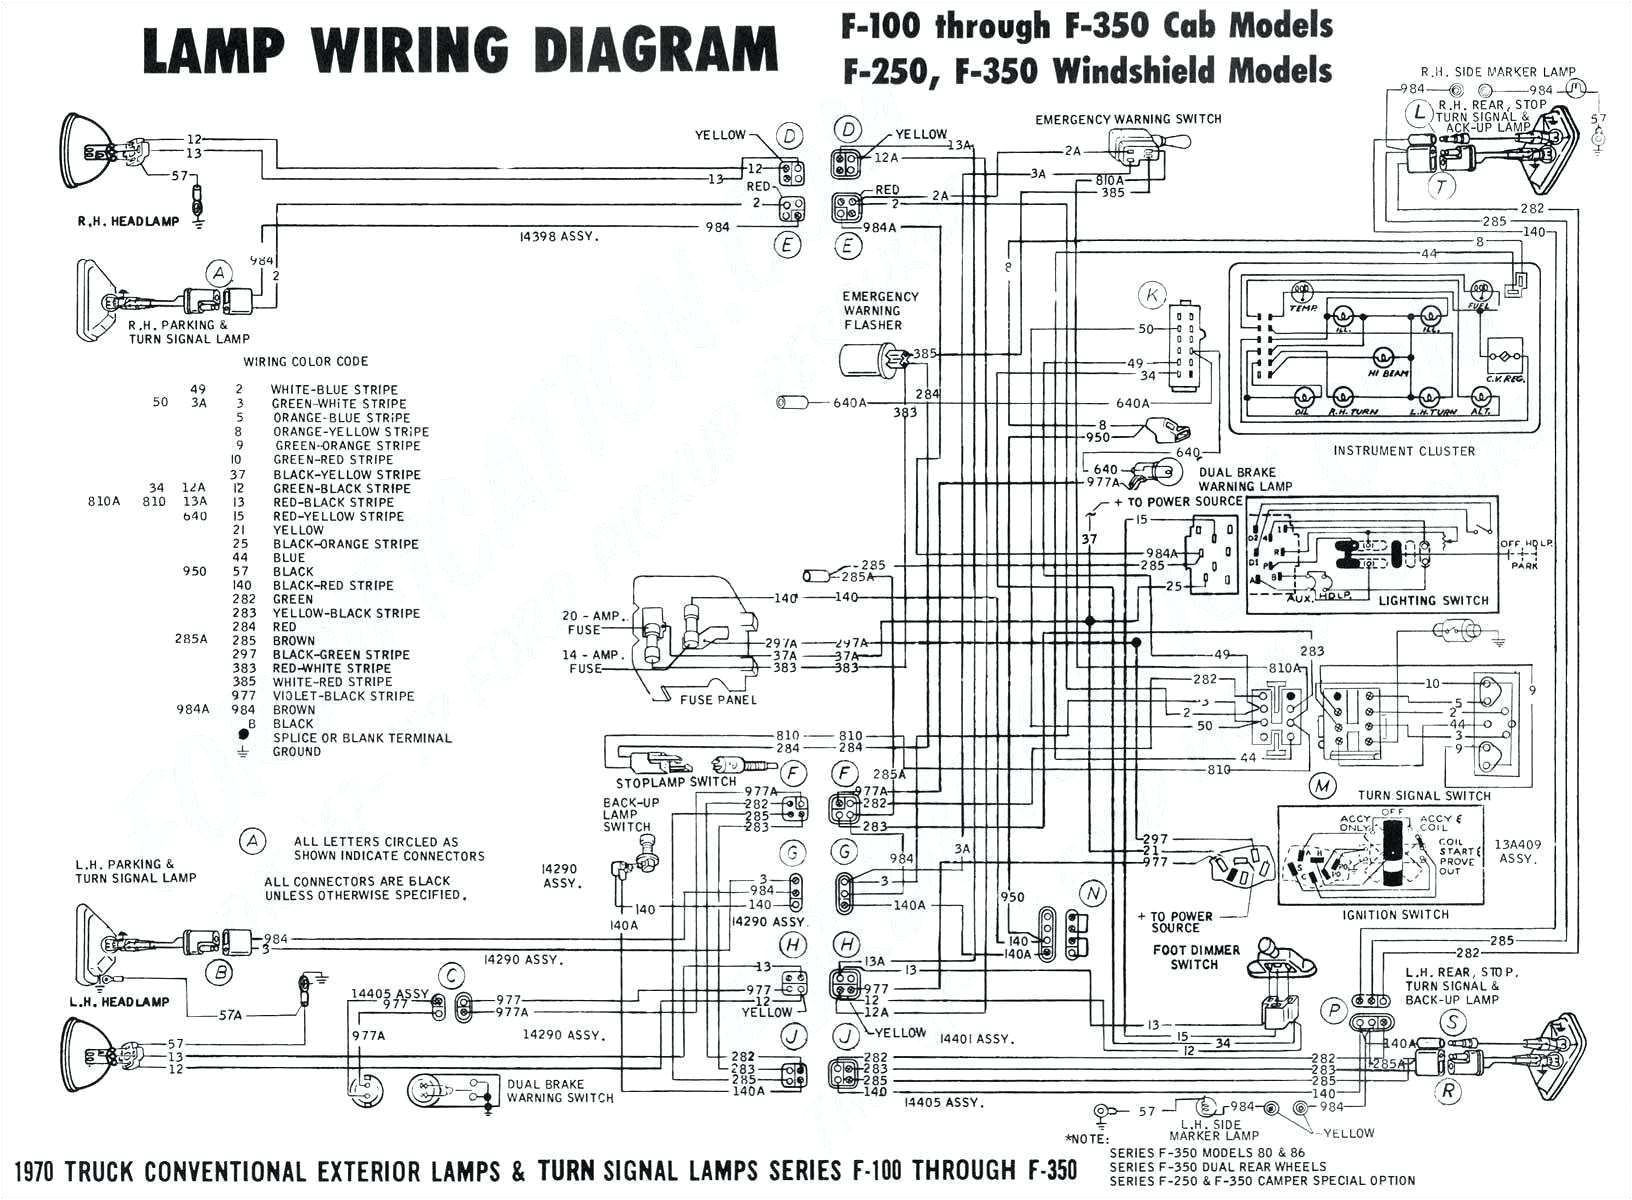 2000 jetta cruise control wiring diagram free download experience 2000 jetta cruise control wiring diagram